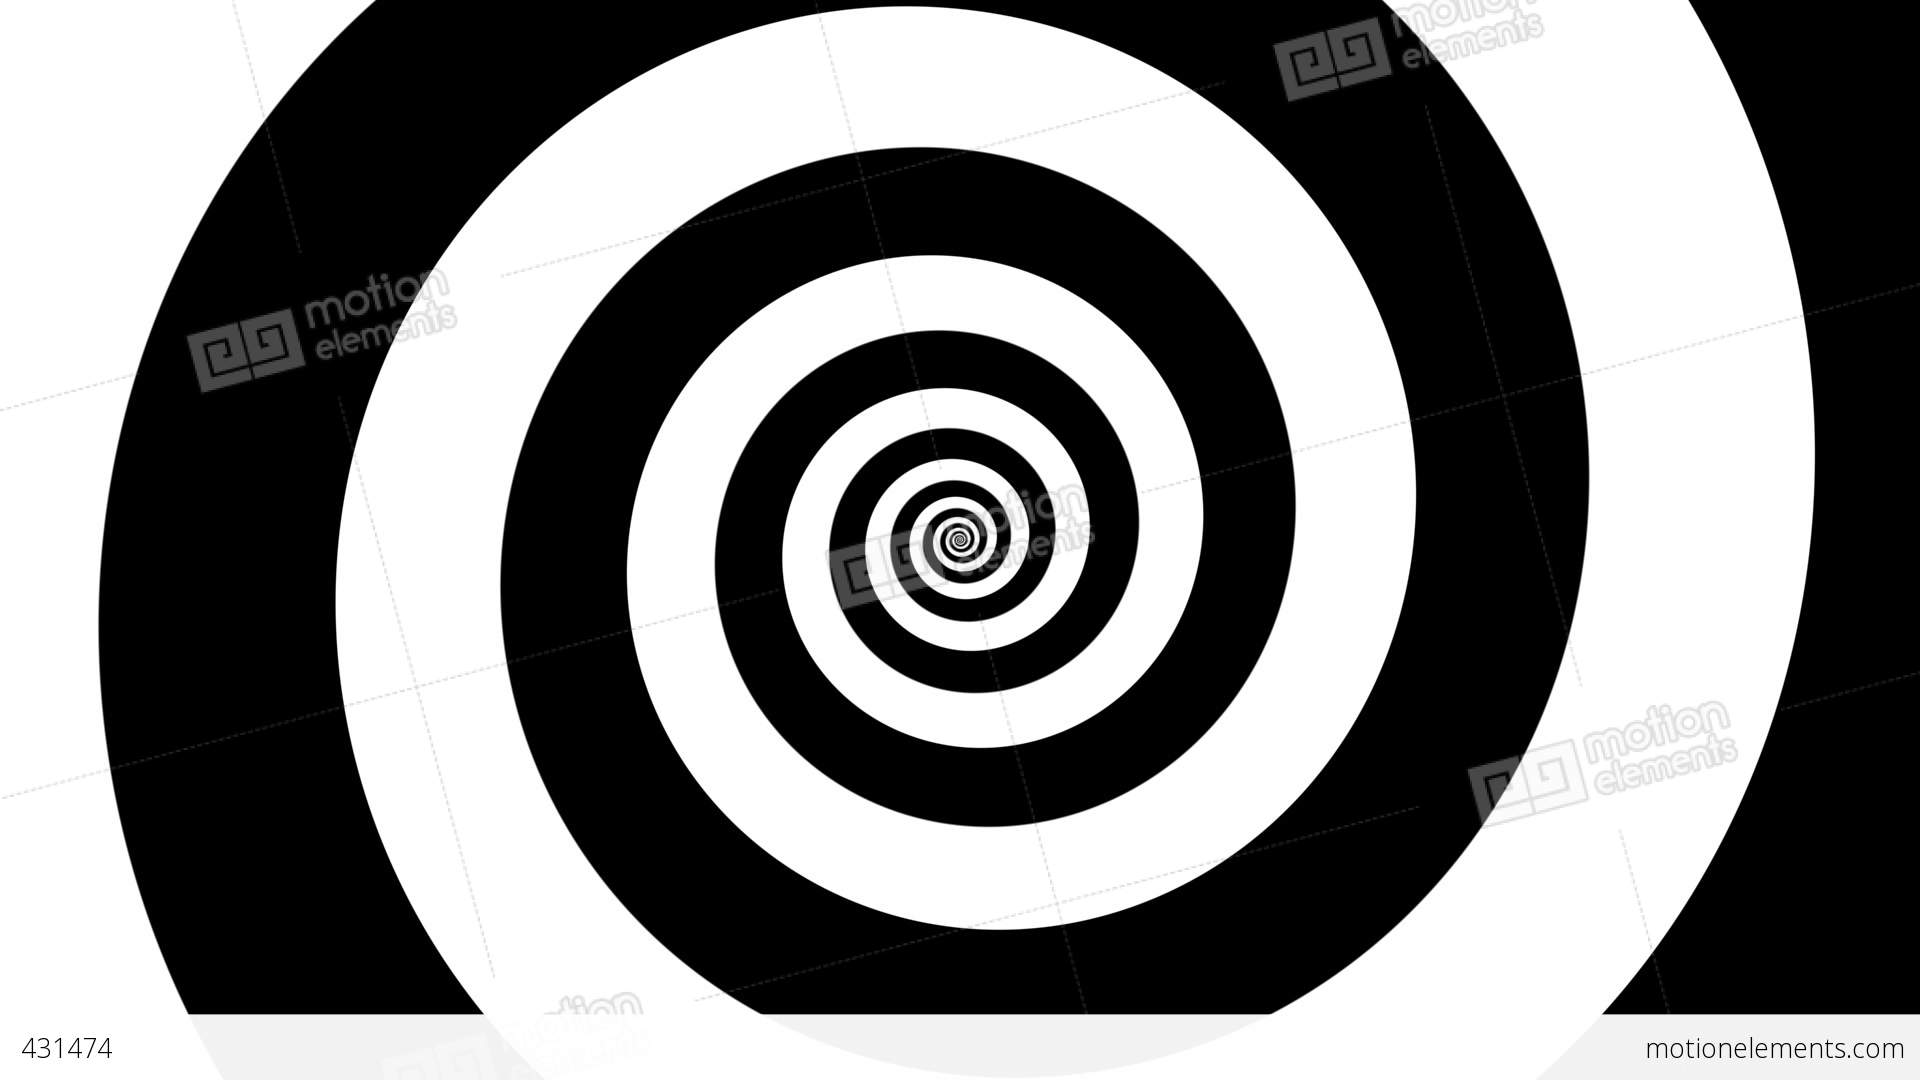 black and white swirls bing images. Black Bedroom Furniture Sets. Home Design Ideas